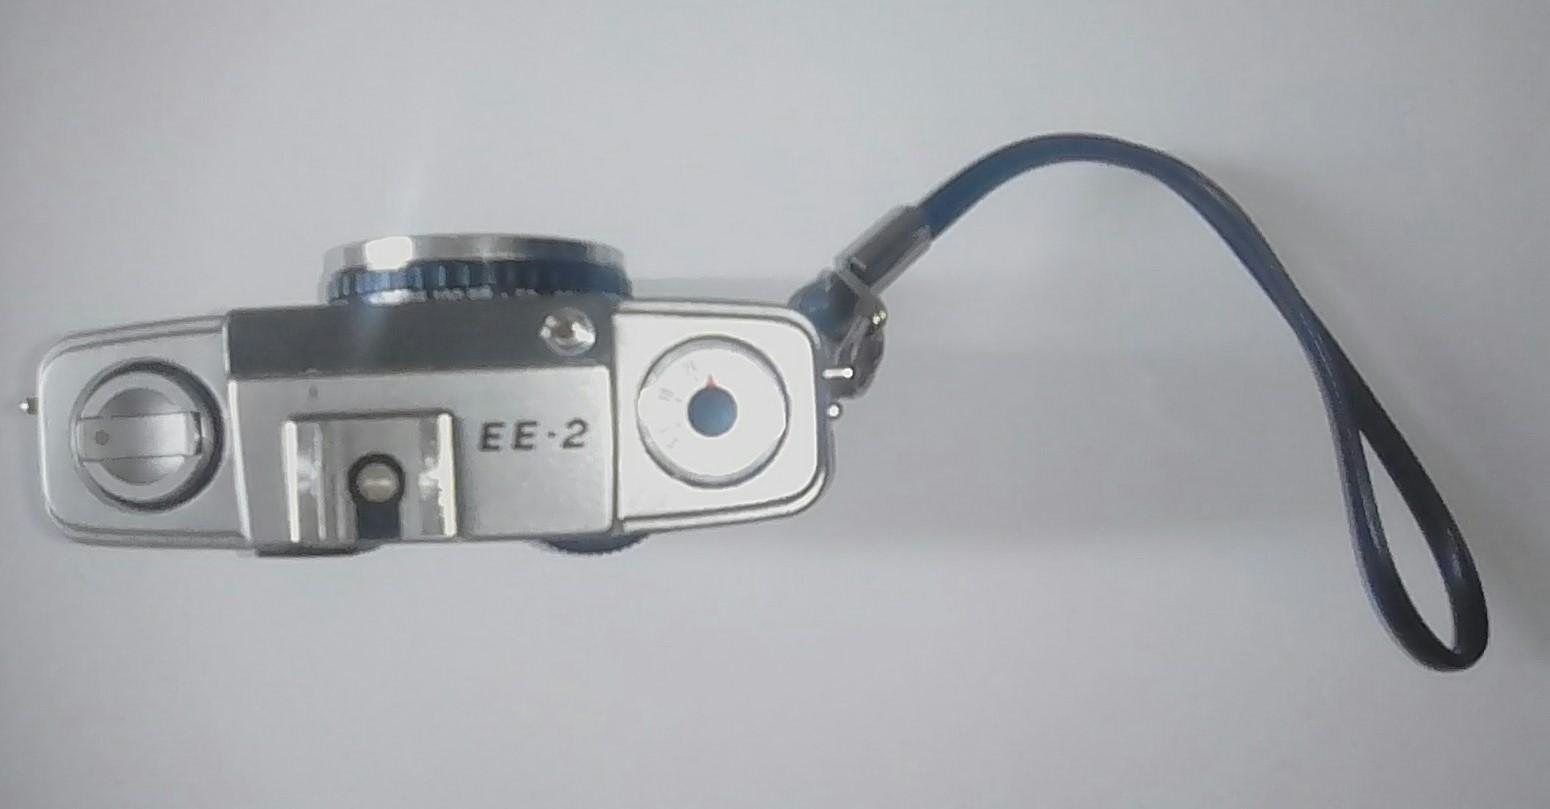 OLYMPUS PEN EE2 CAMERA - Collectors' ITEM for SALE